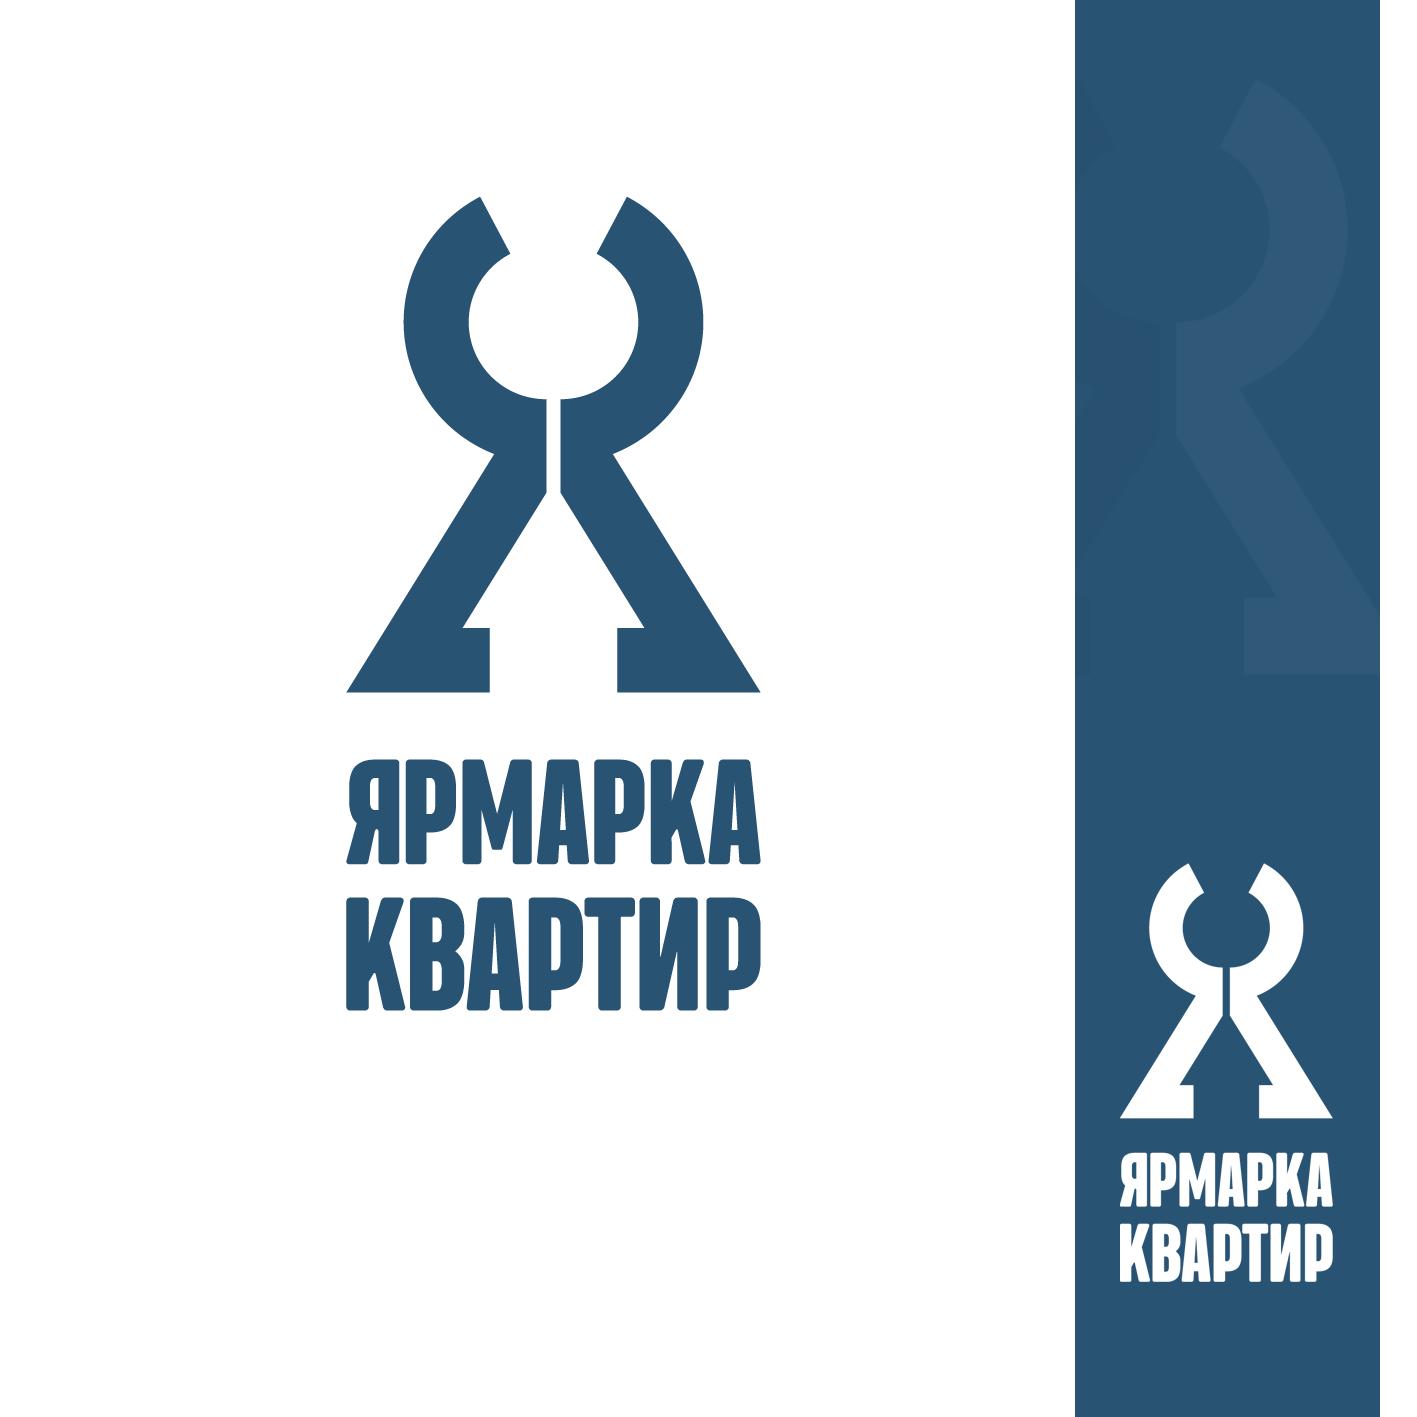 Создание логотипа, с вариантами для визитки и листовки фото f_34160047c49a38c4.png